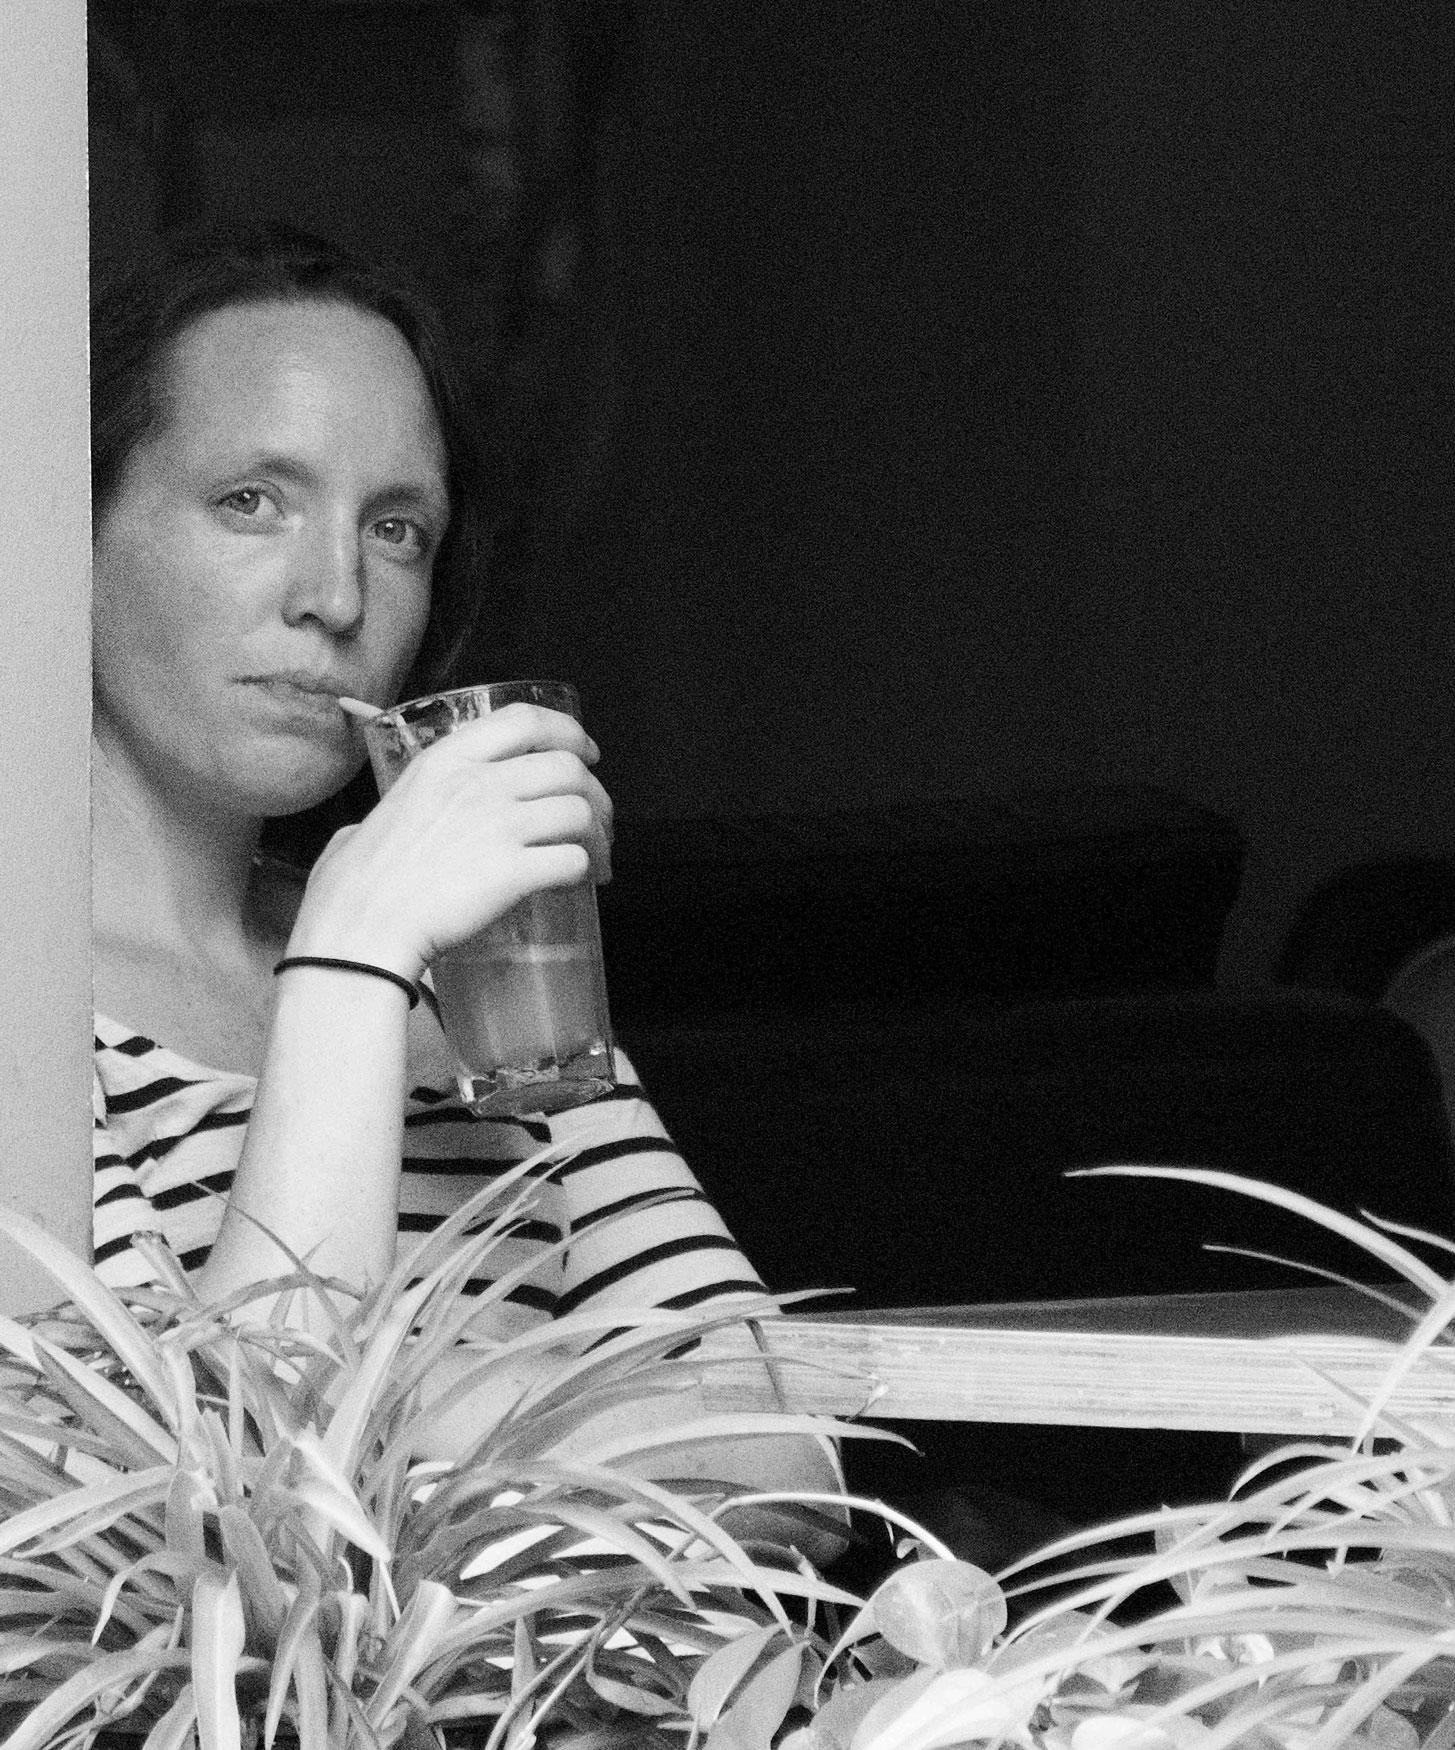 8669-woman-staring-out-restaurant-window-Beijing.jpg